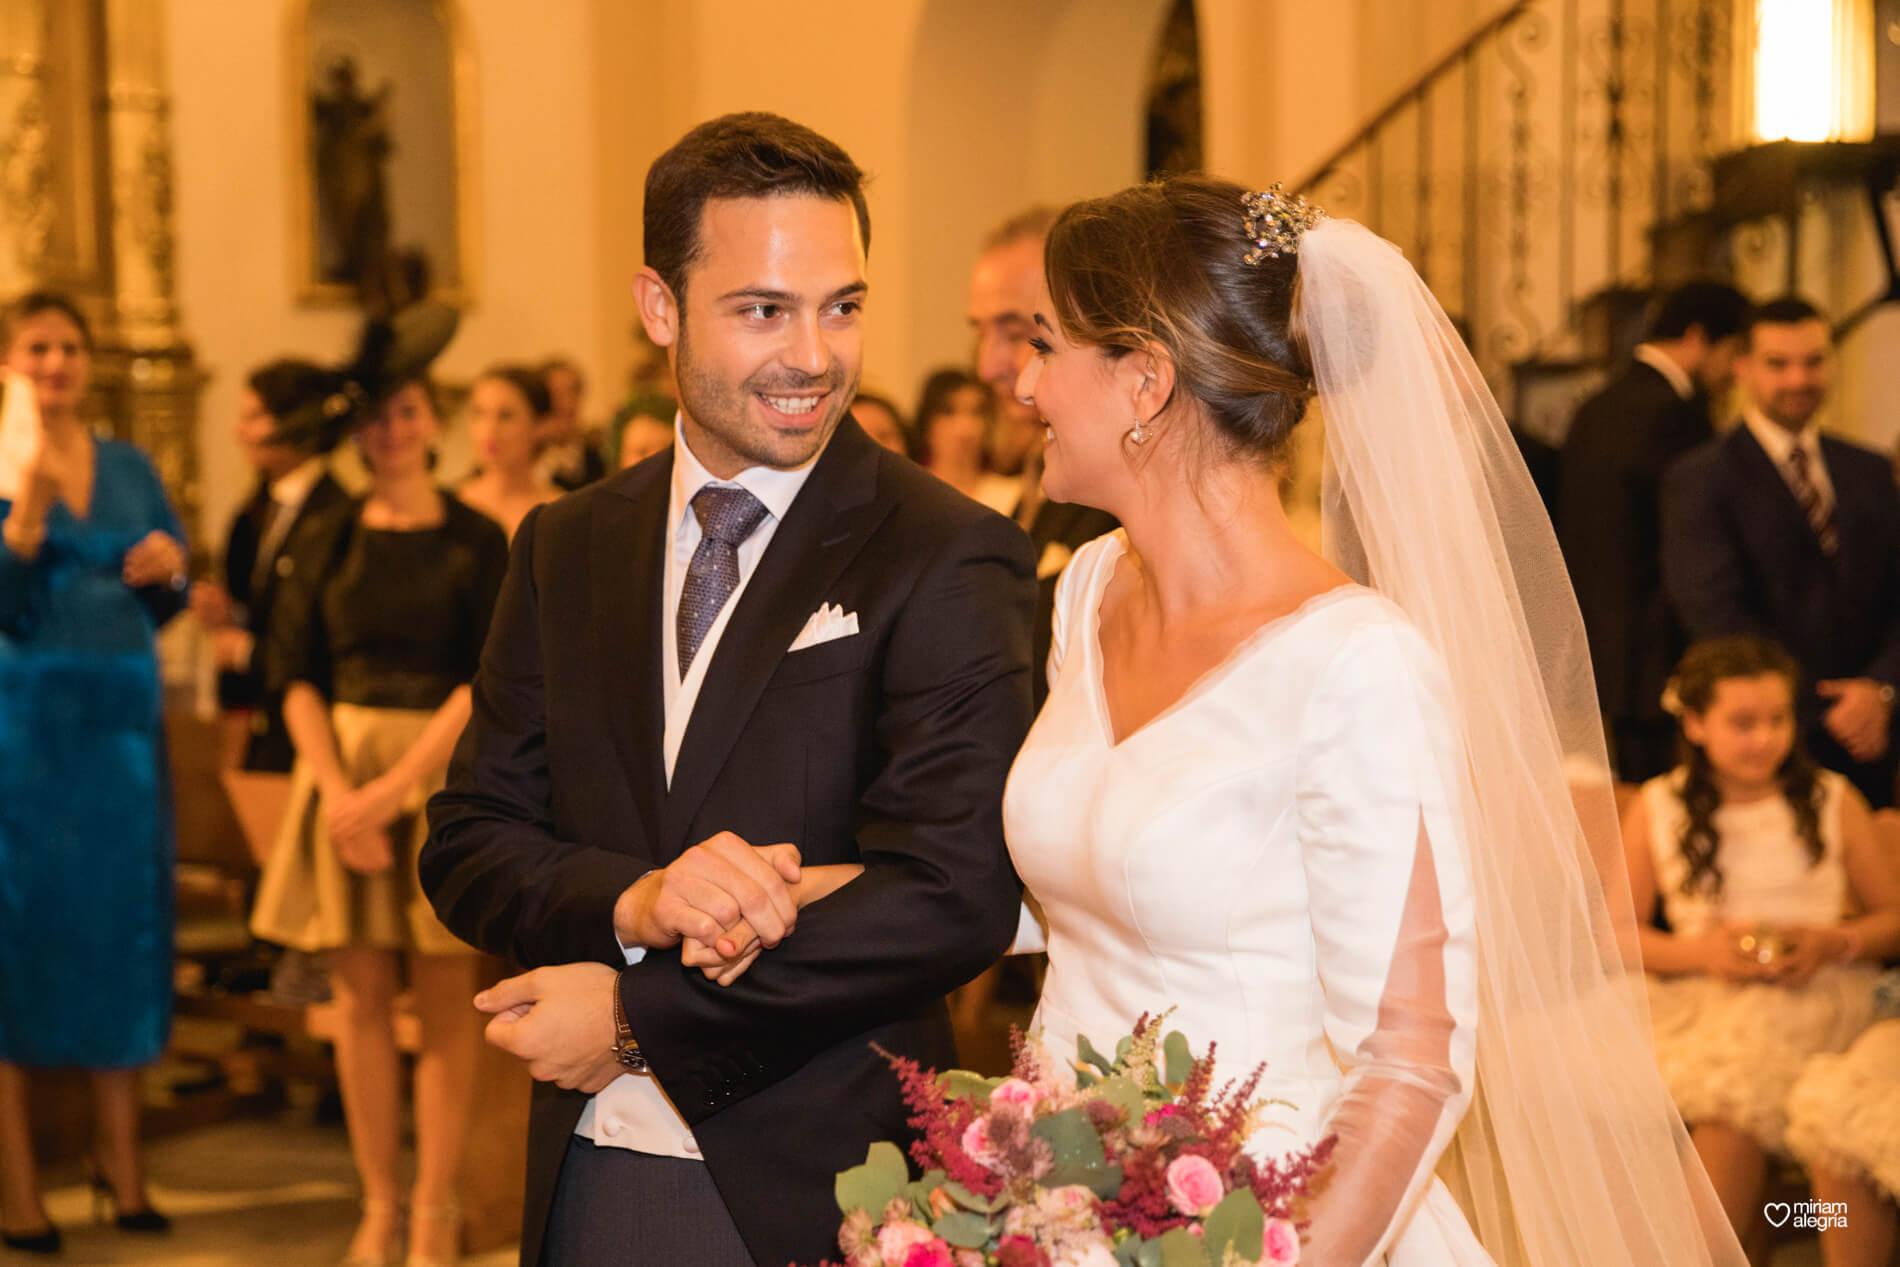 vestido-de-novia-paula-del-vas-miriam-alegria-fotografos-boda-murcia-48